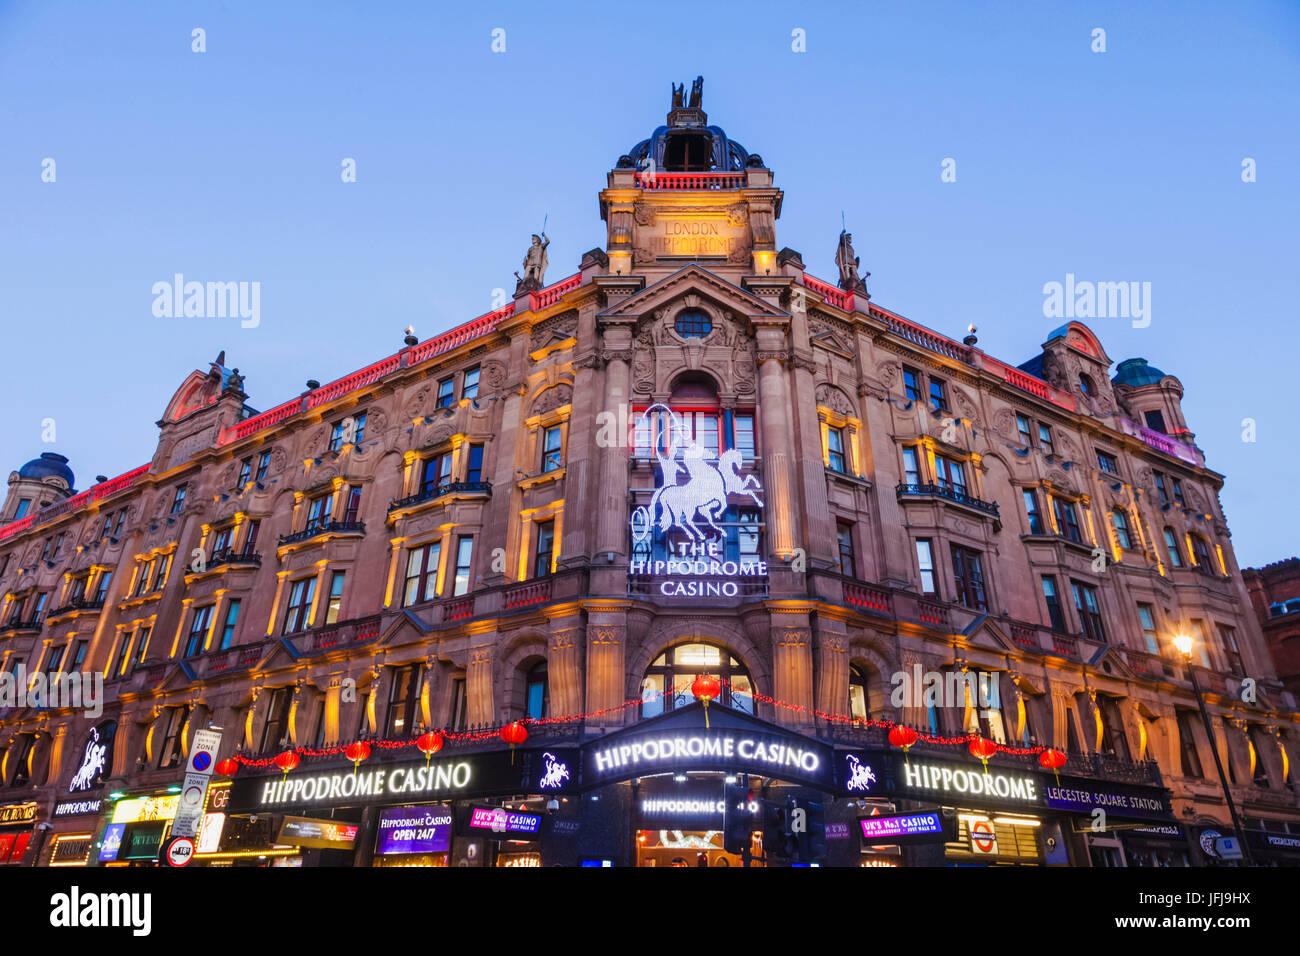 England, London, Soho, Leicester Square, The Hippodrome Casino - Stock Image